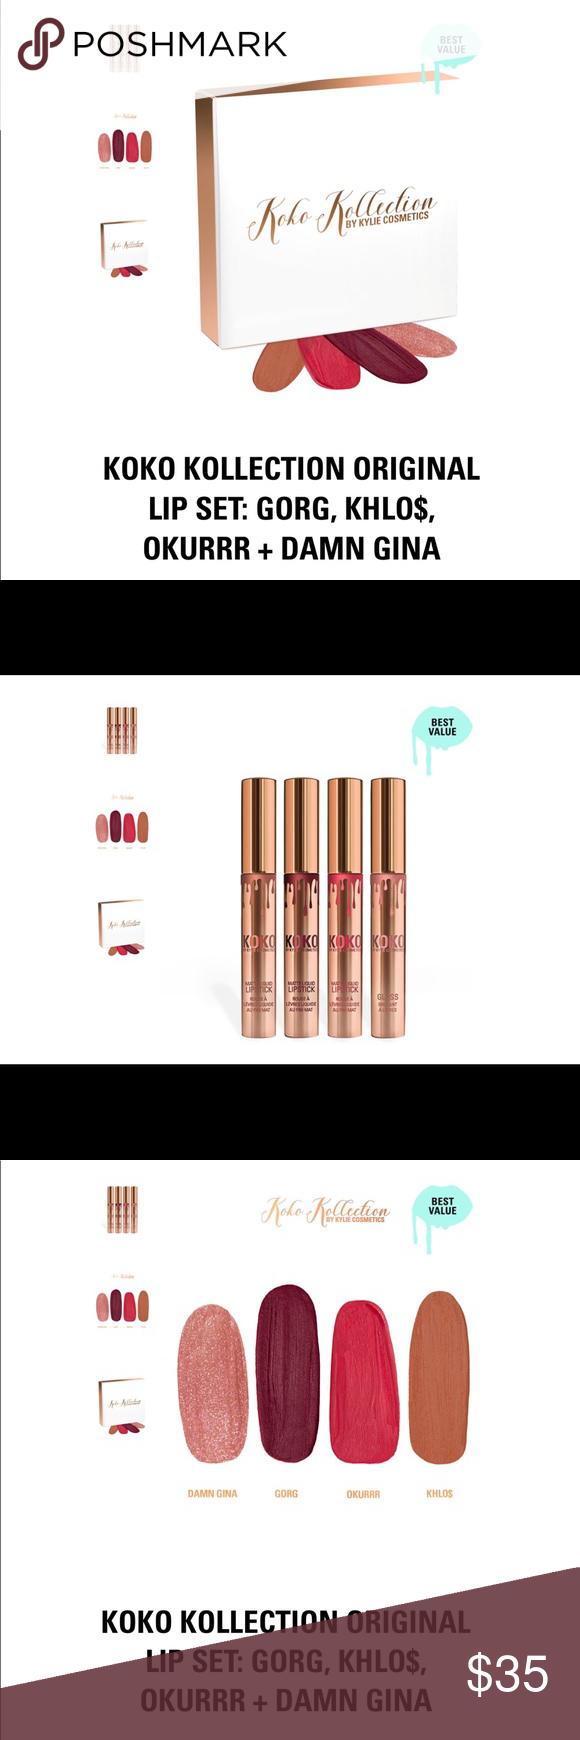 Koko Collection Original Brand New Kylie Jenner Koko Collection Matte Lip Set Makeup Lipstick Matte Lips Lip Set Lipstick